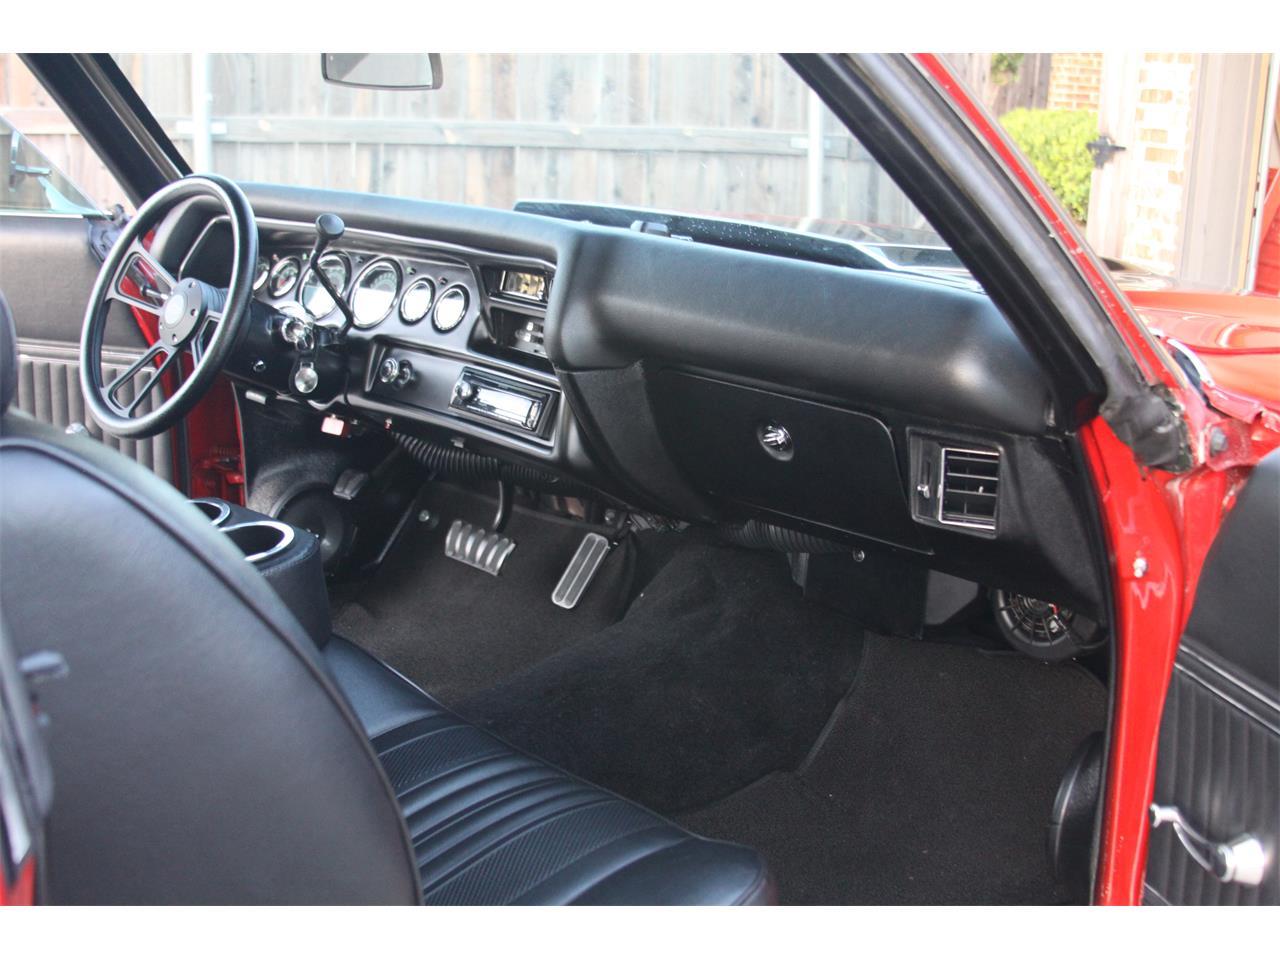 1970 Chevrolet Chevelle Malibu (CC-1232980) for sale in Midland, Texas